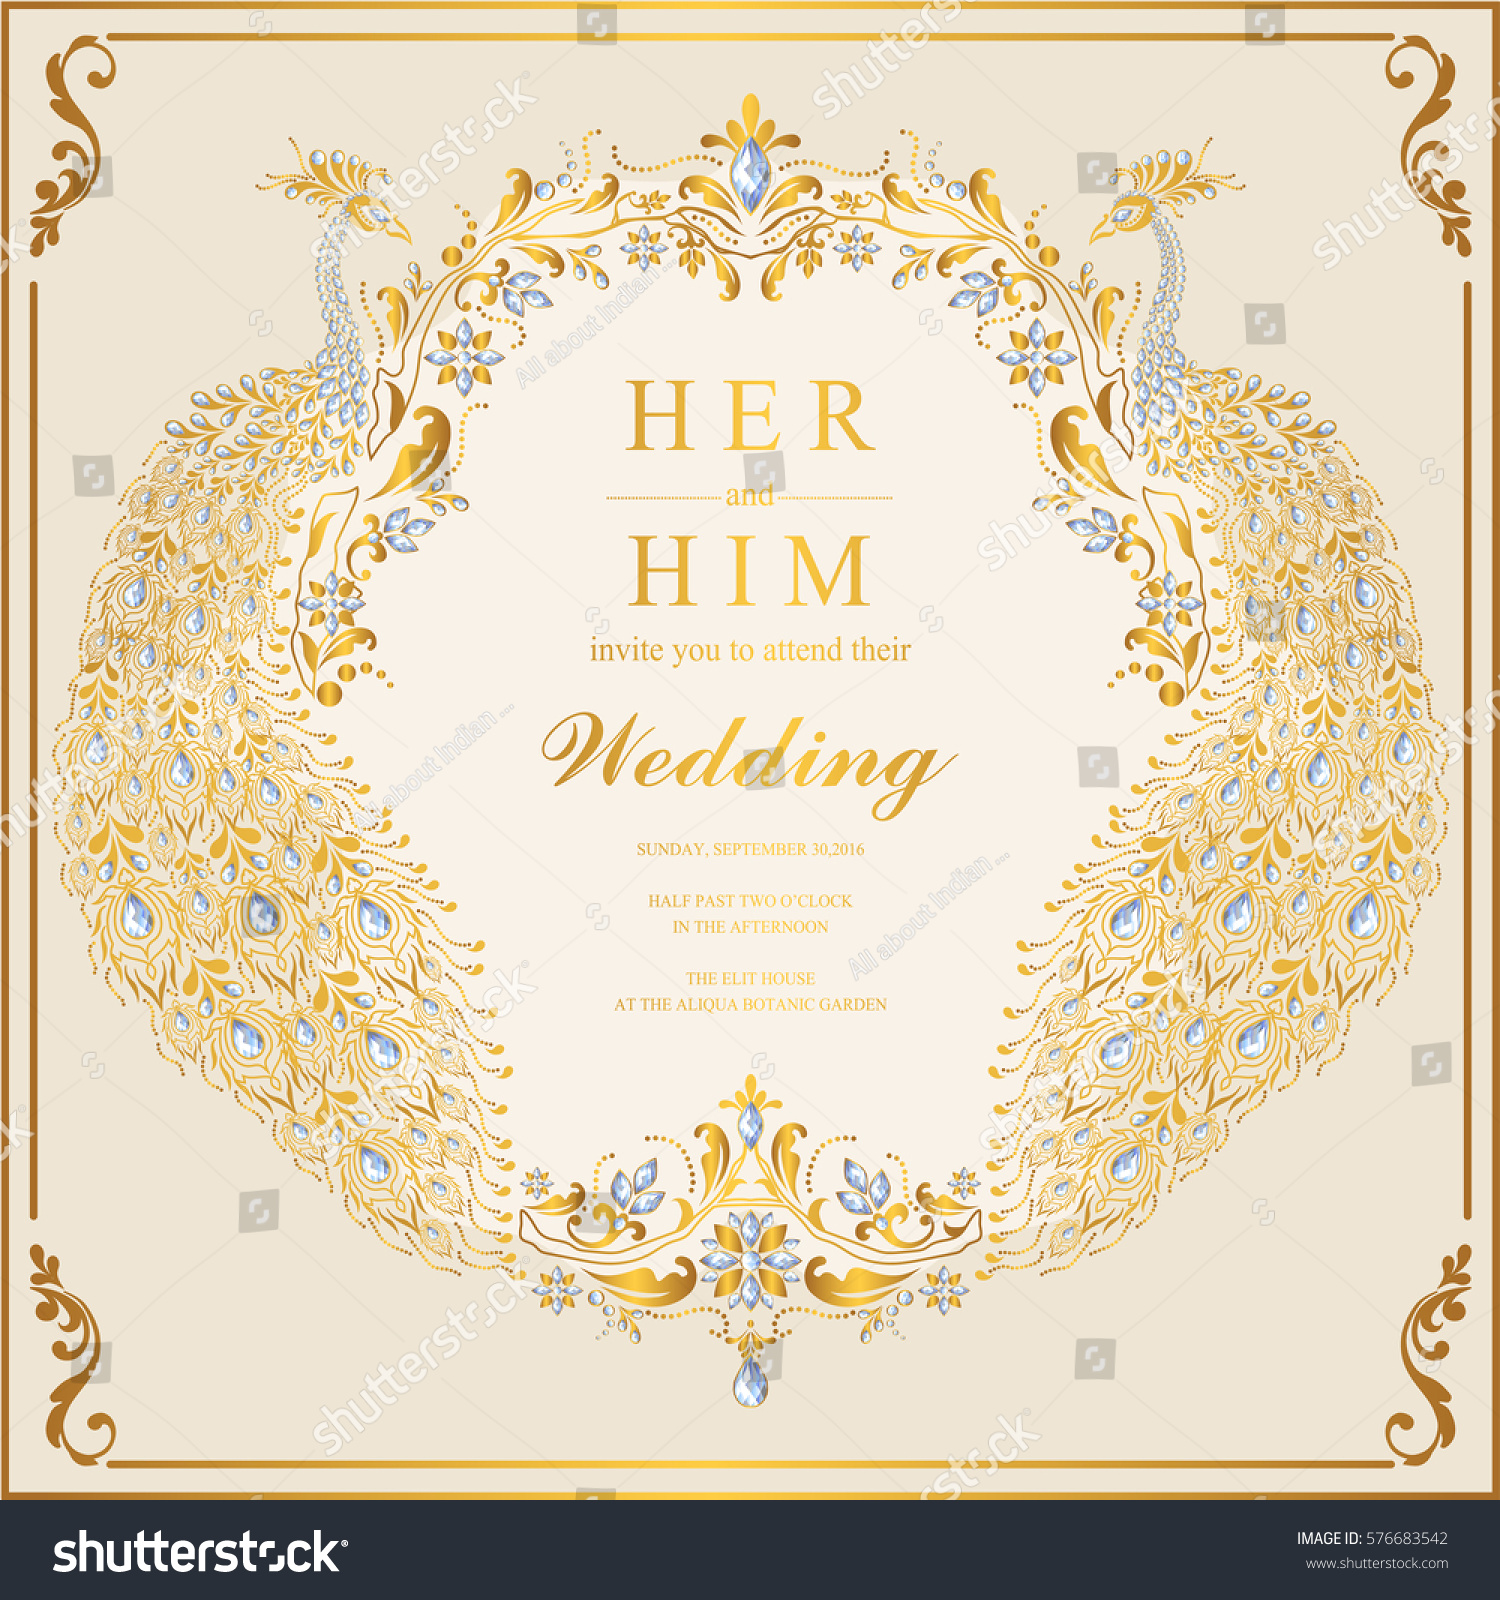 Indian Wedding Invitation Card Templates Gold Stock Vector 576683542 ...